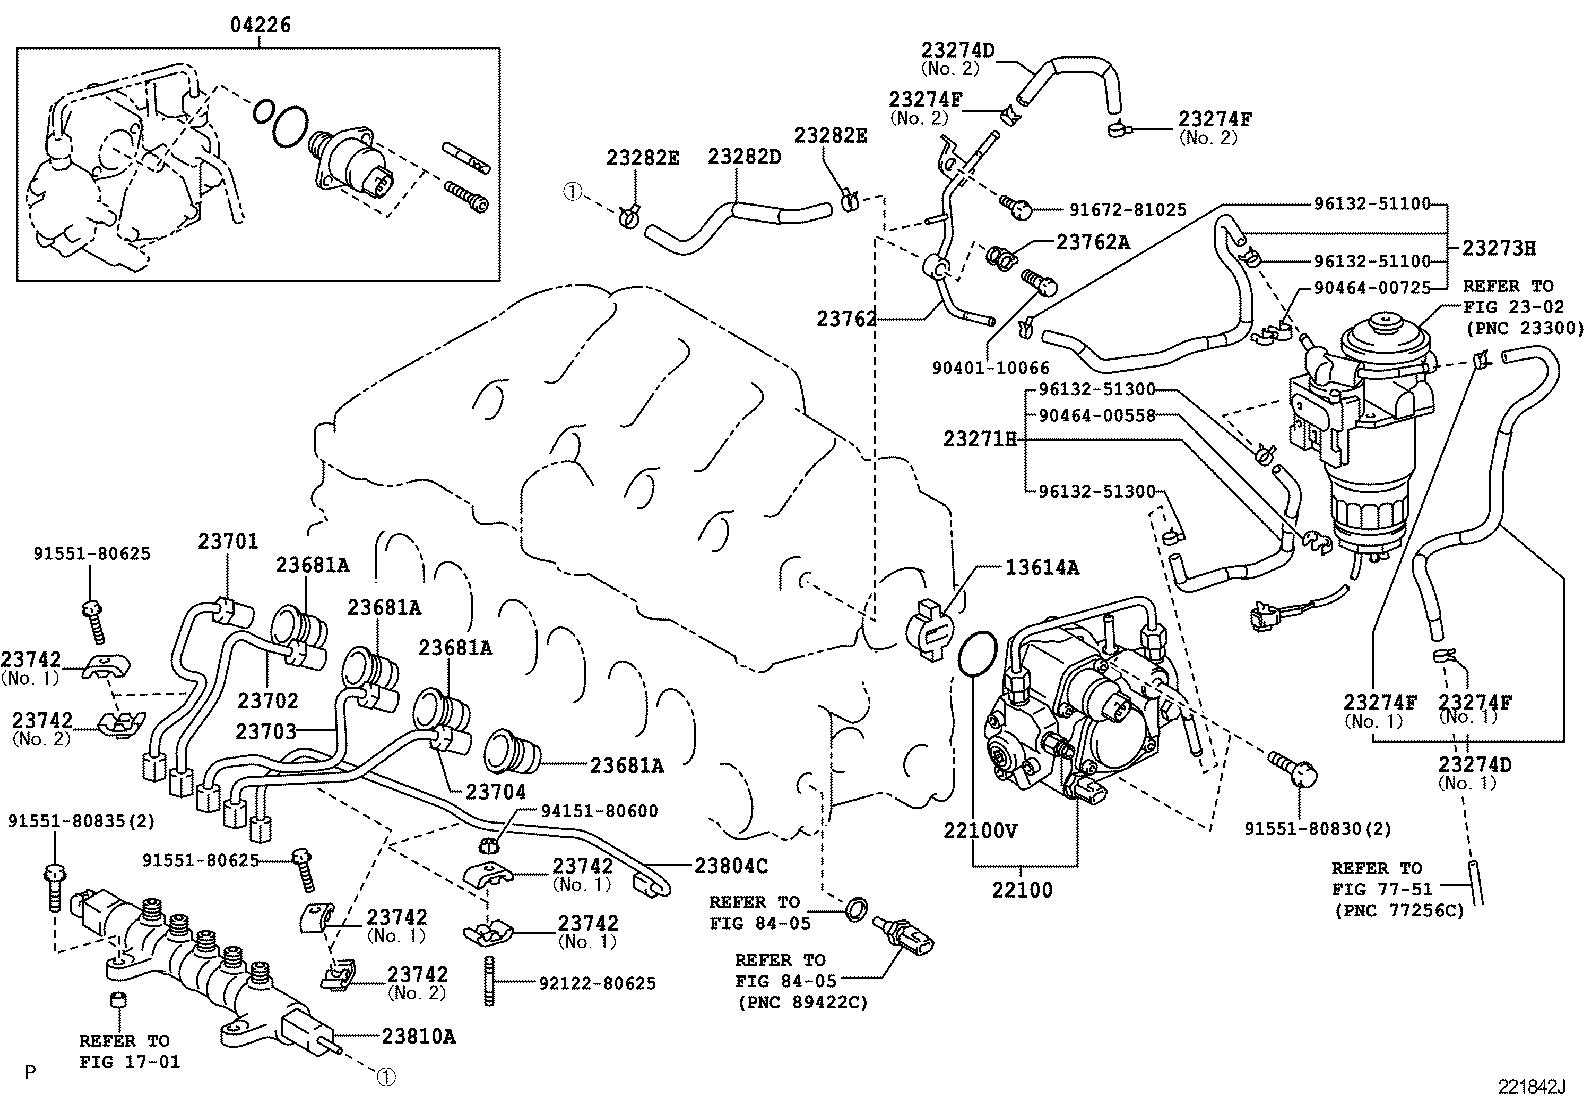 hight resolution of diagram of toyota rav4 engine diagram get free image 1997 rav4 engine diagram 1998 rav4 engine